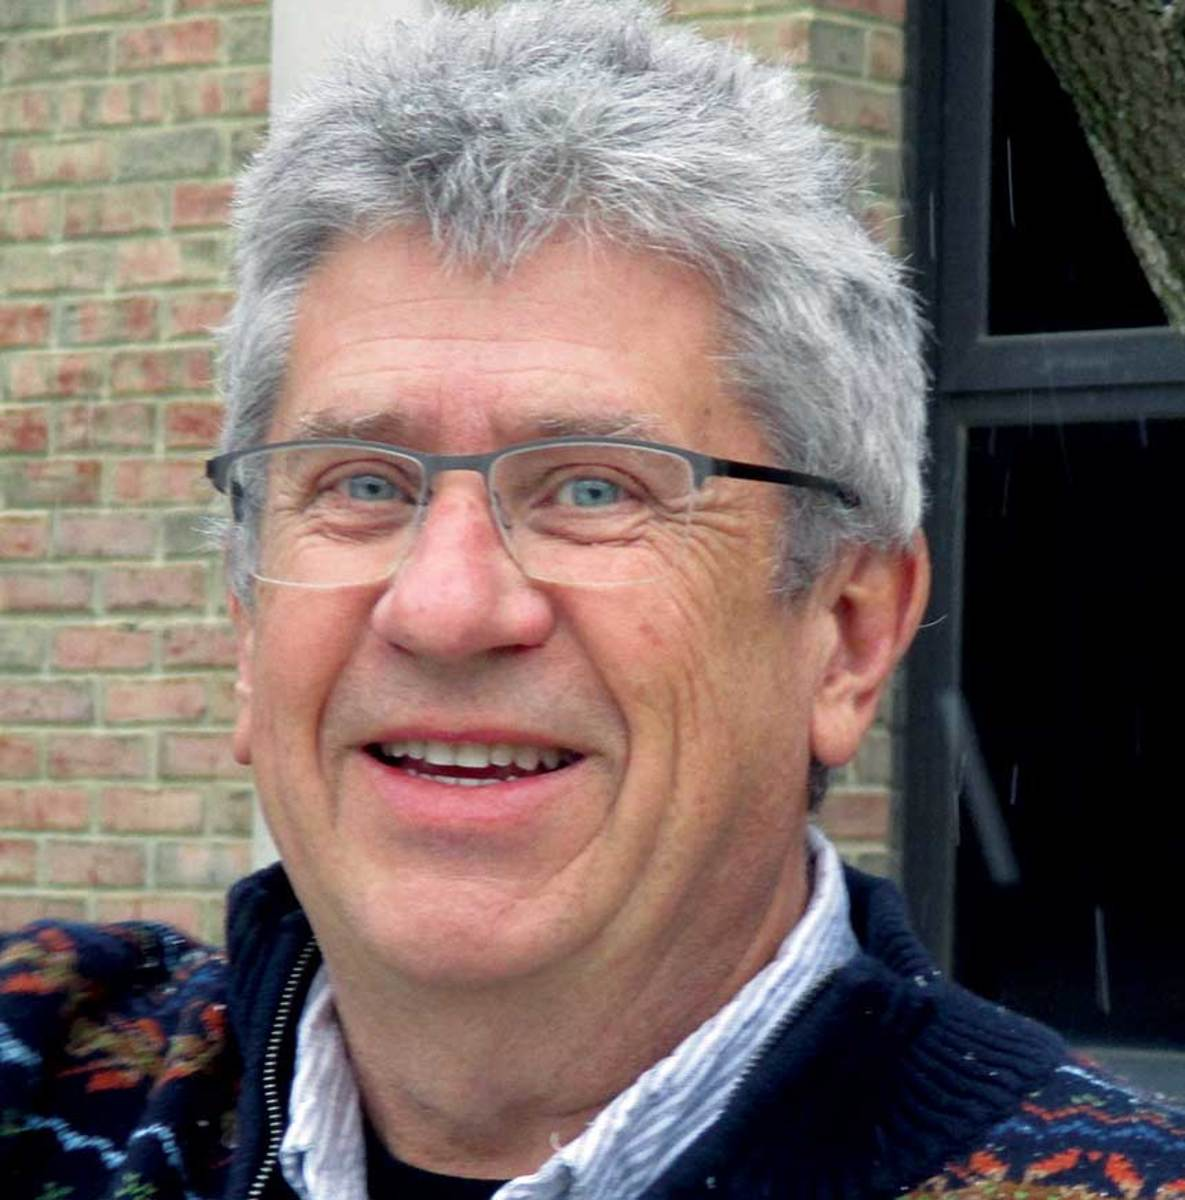 Dr. Richard Rood